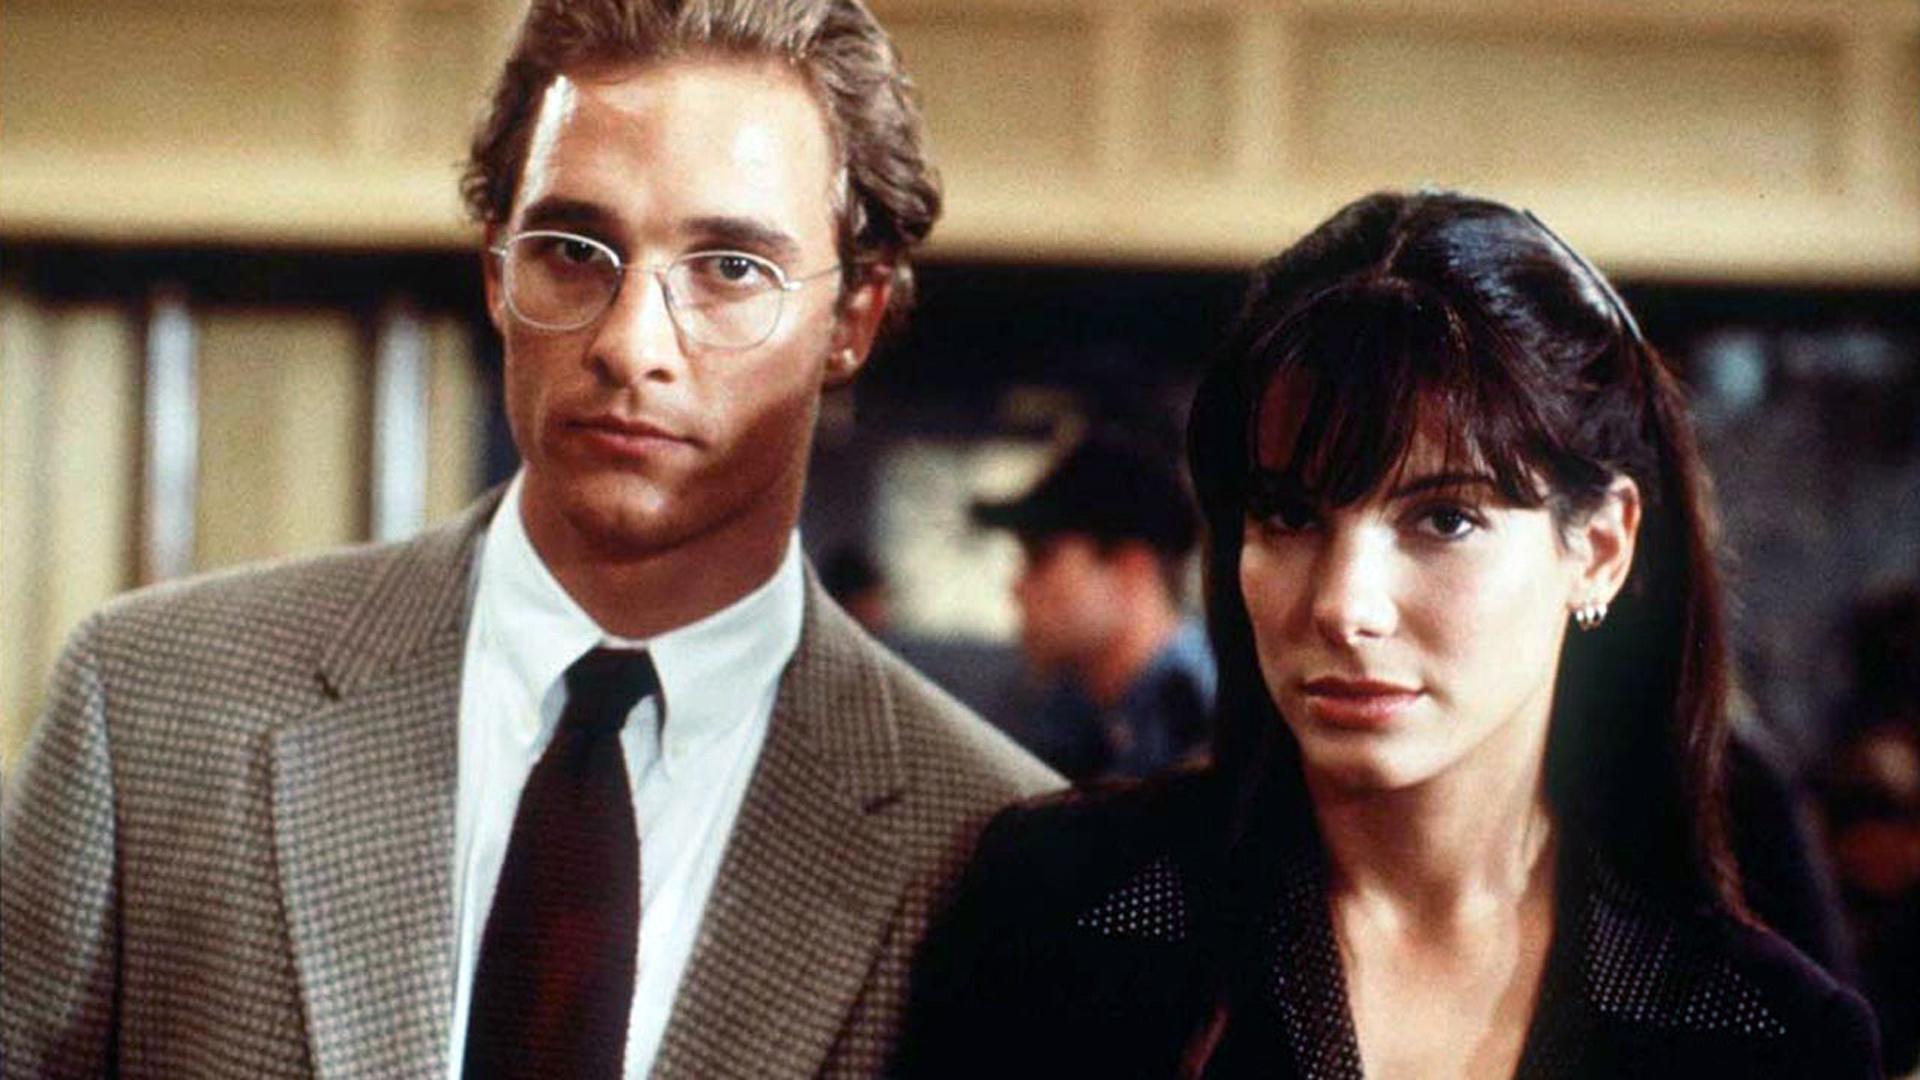 Matthew McConaughey     and Sandra Bullock in  A Time to Kill , filmed in Mississippi - image via  Google .